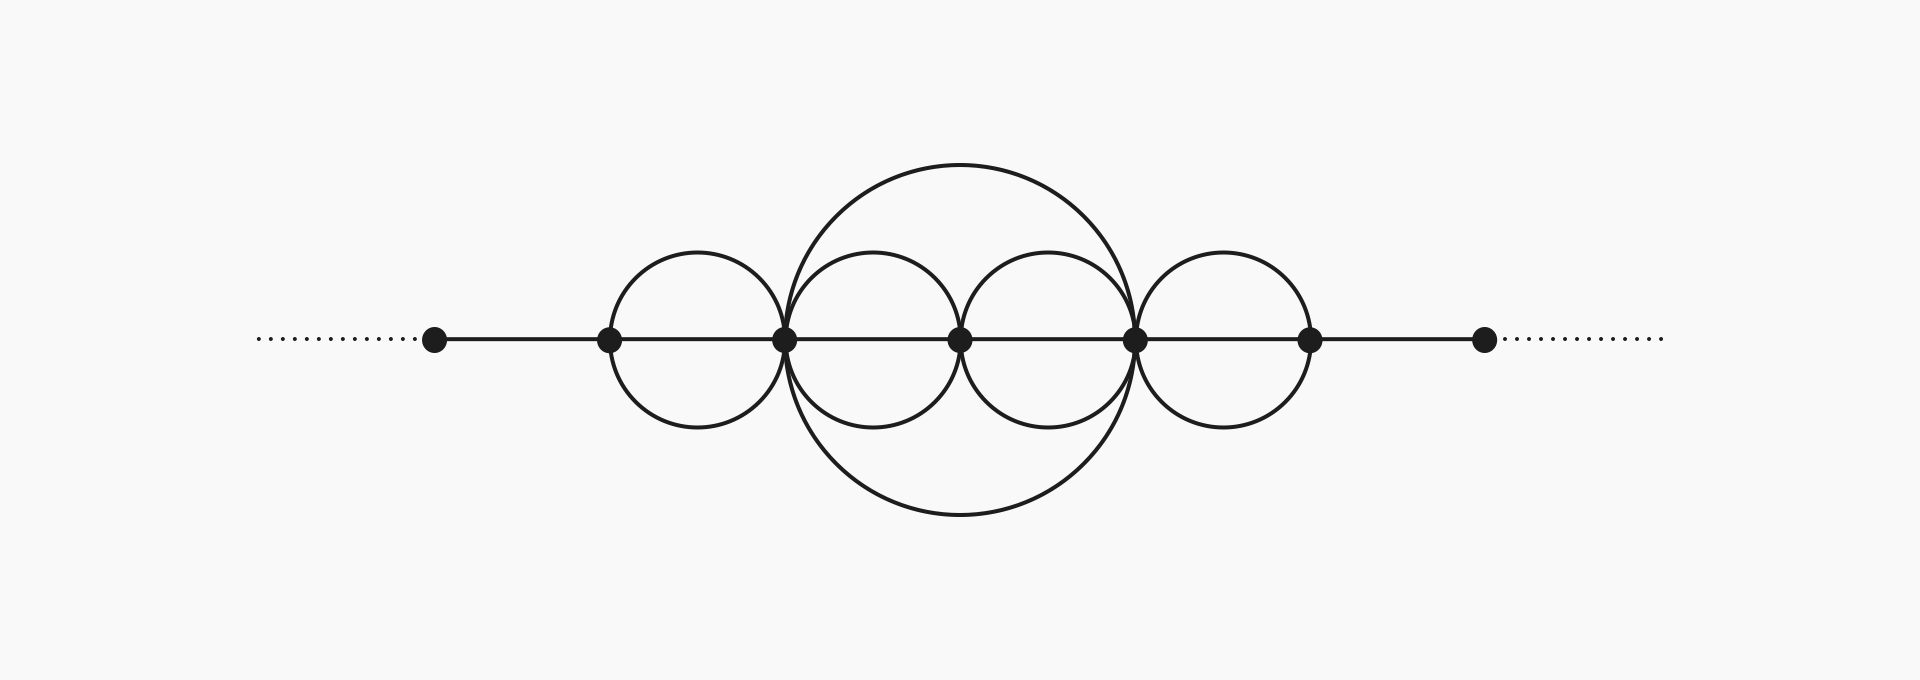 wesjonesco-iterative-process.png